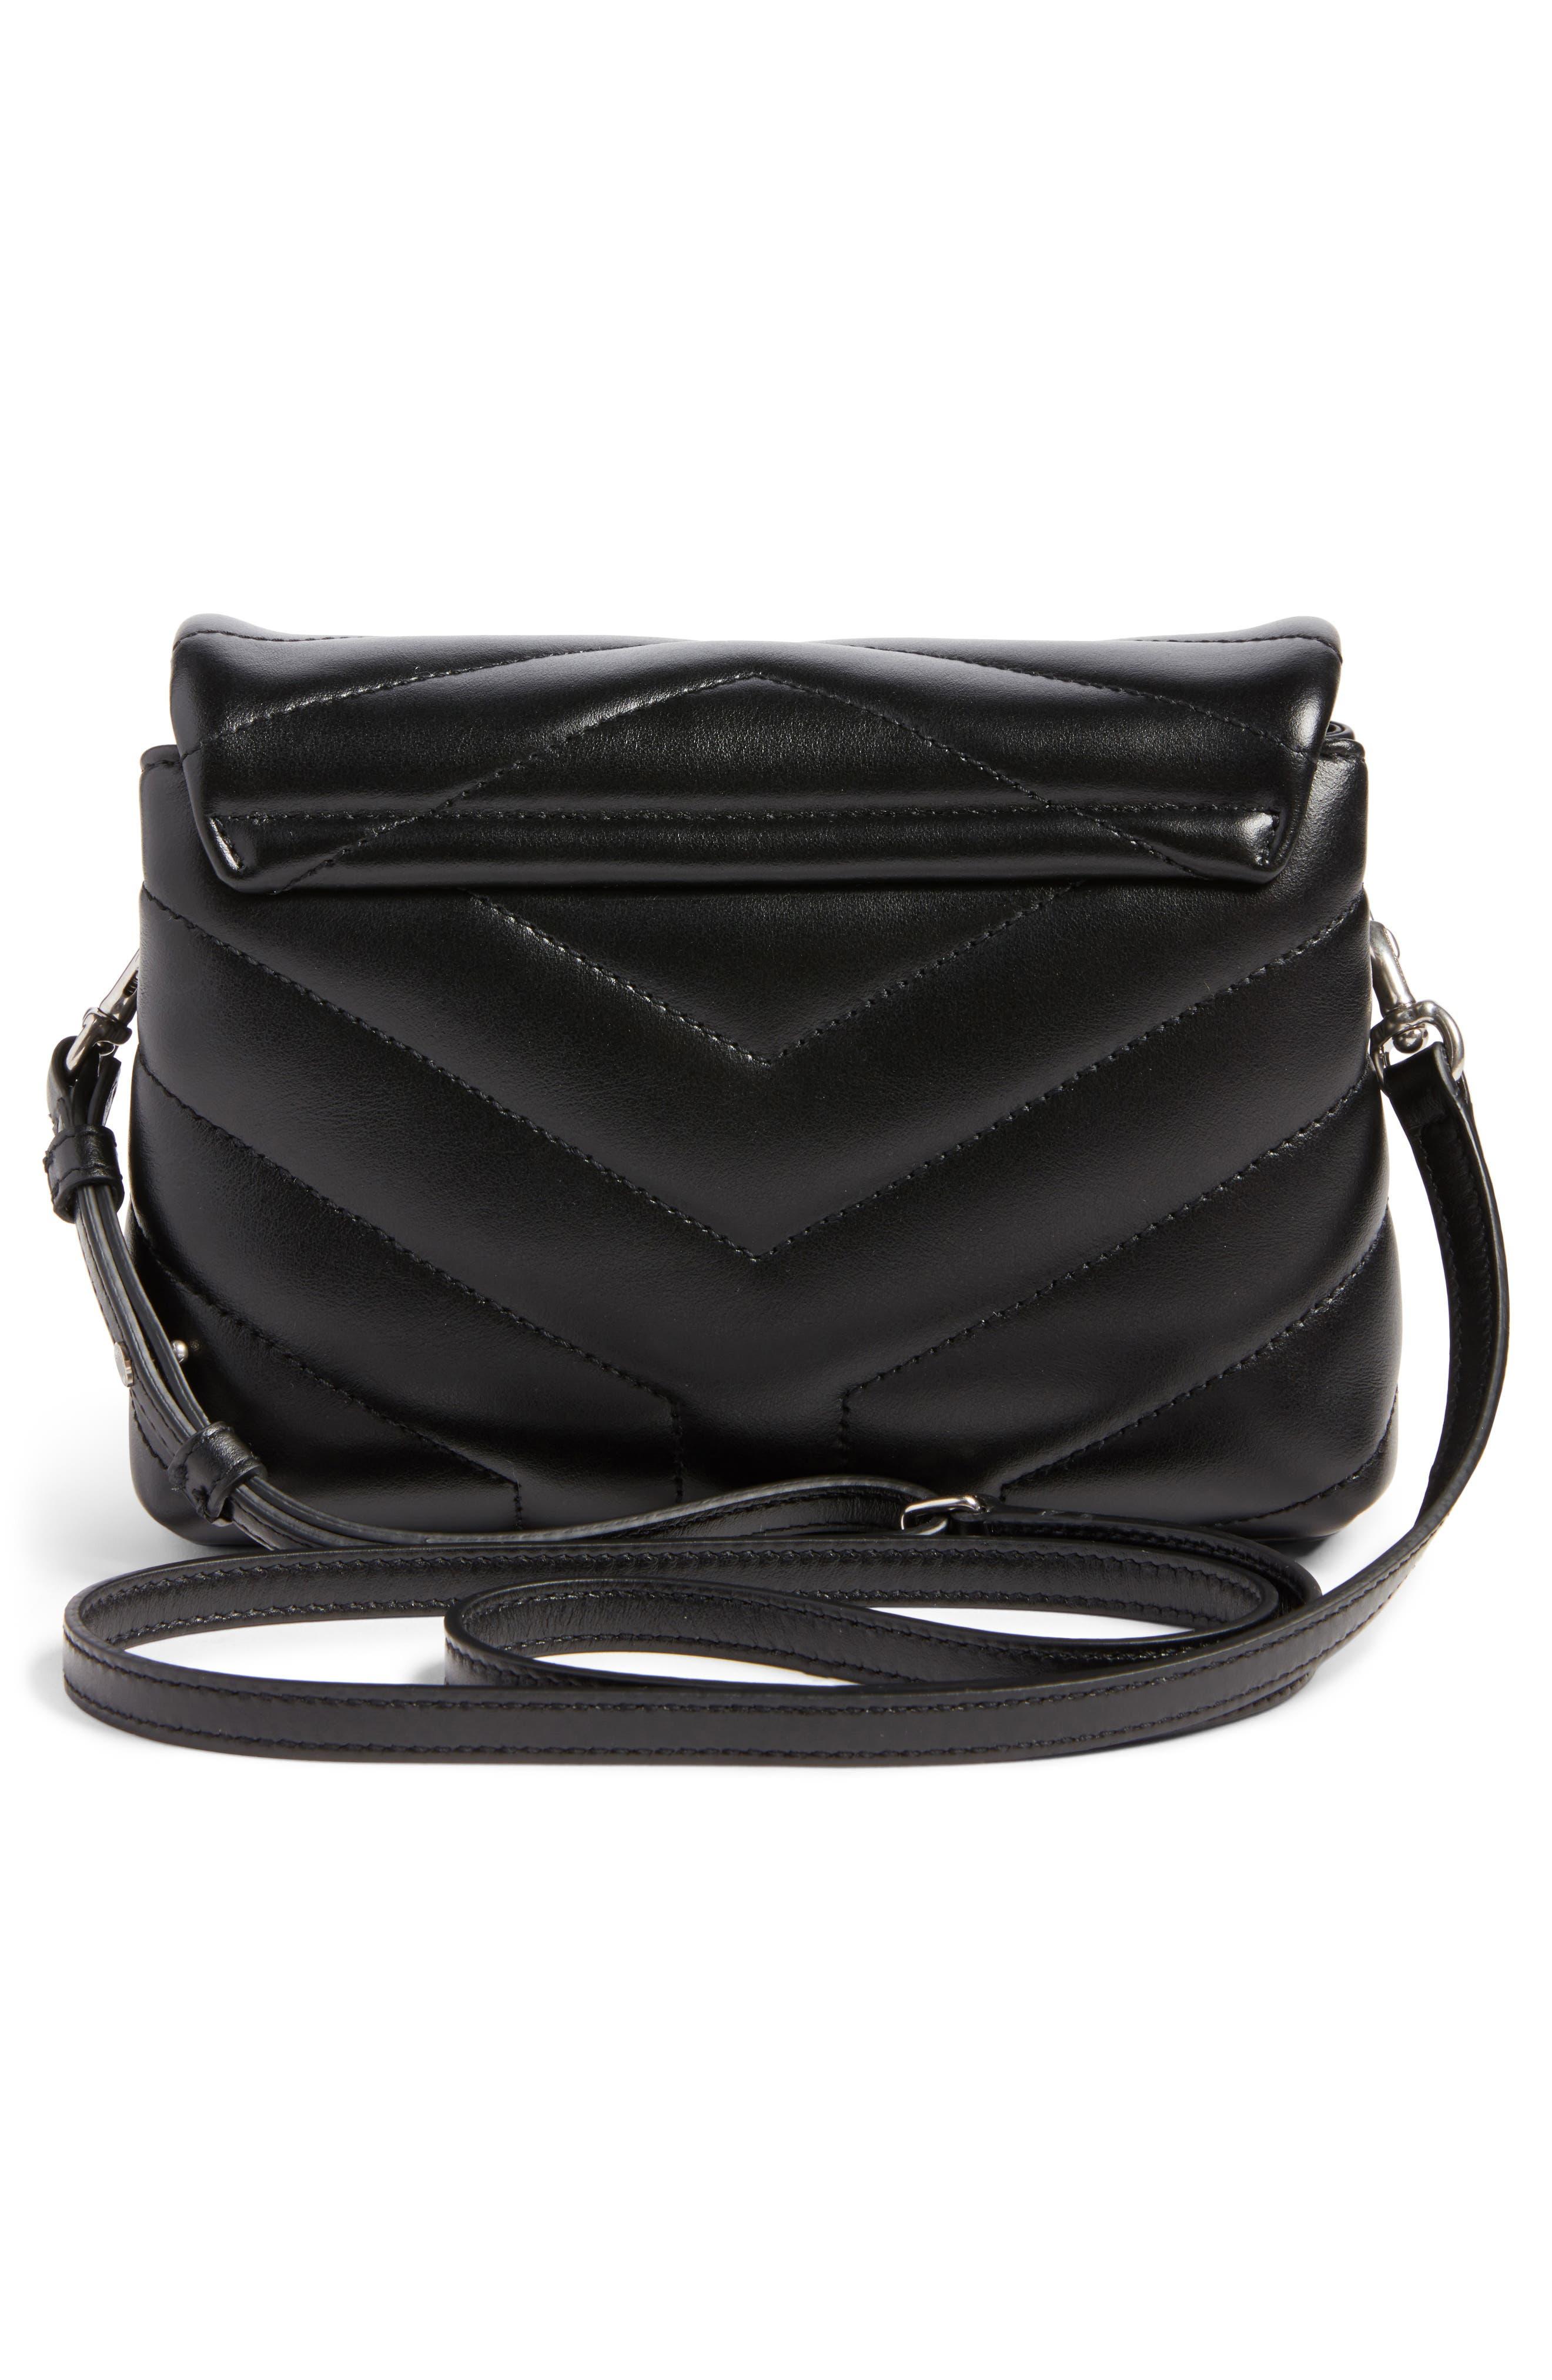 Alternate Image 3  - Saint Laurent Toy LouLou Calfskin Leather Crossbody Bag